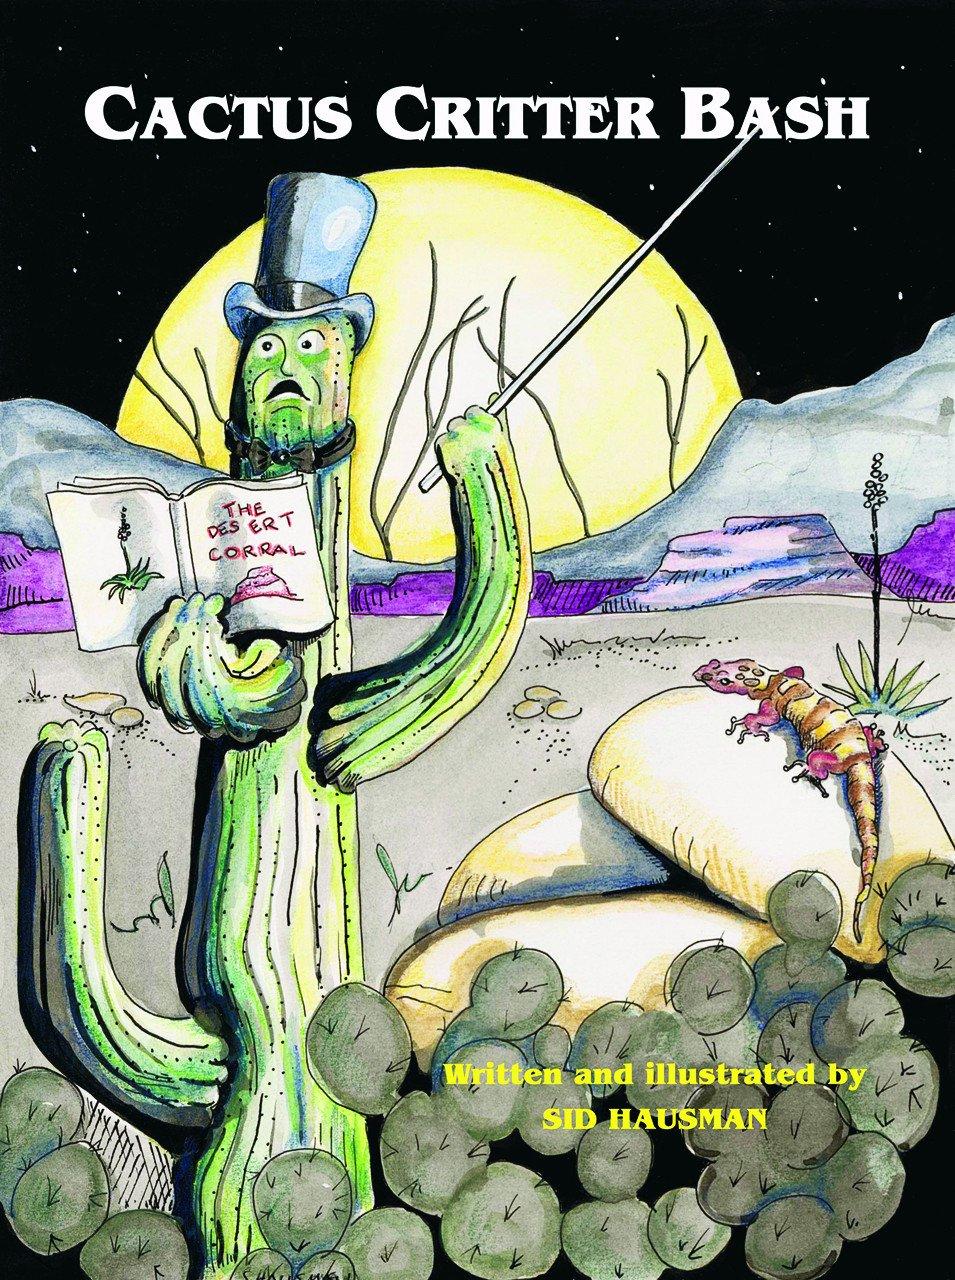 Cactus Critter Bash ebook